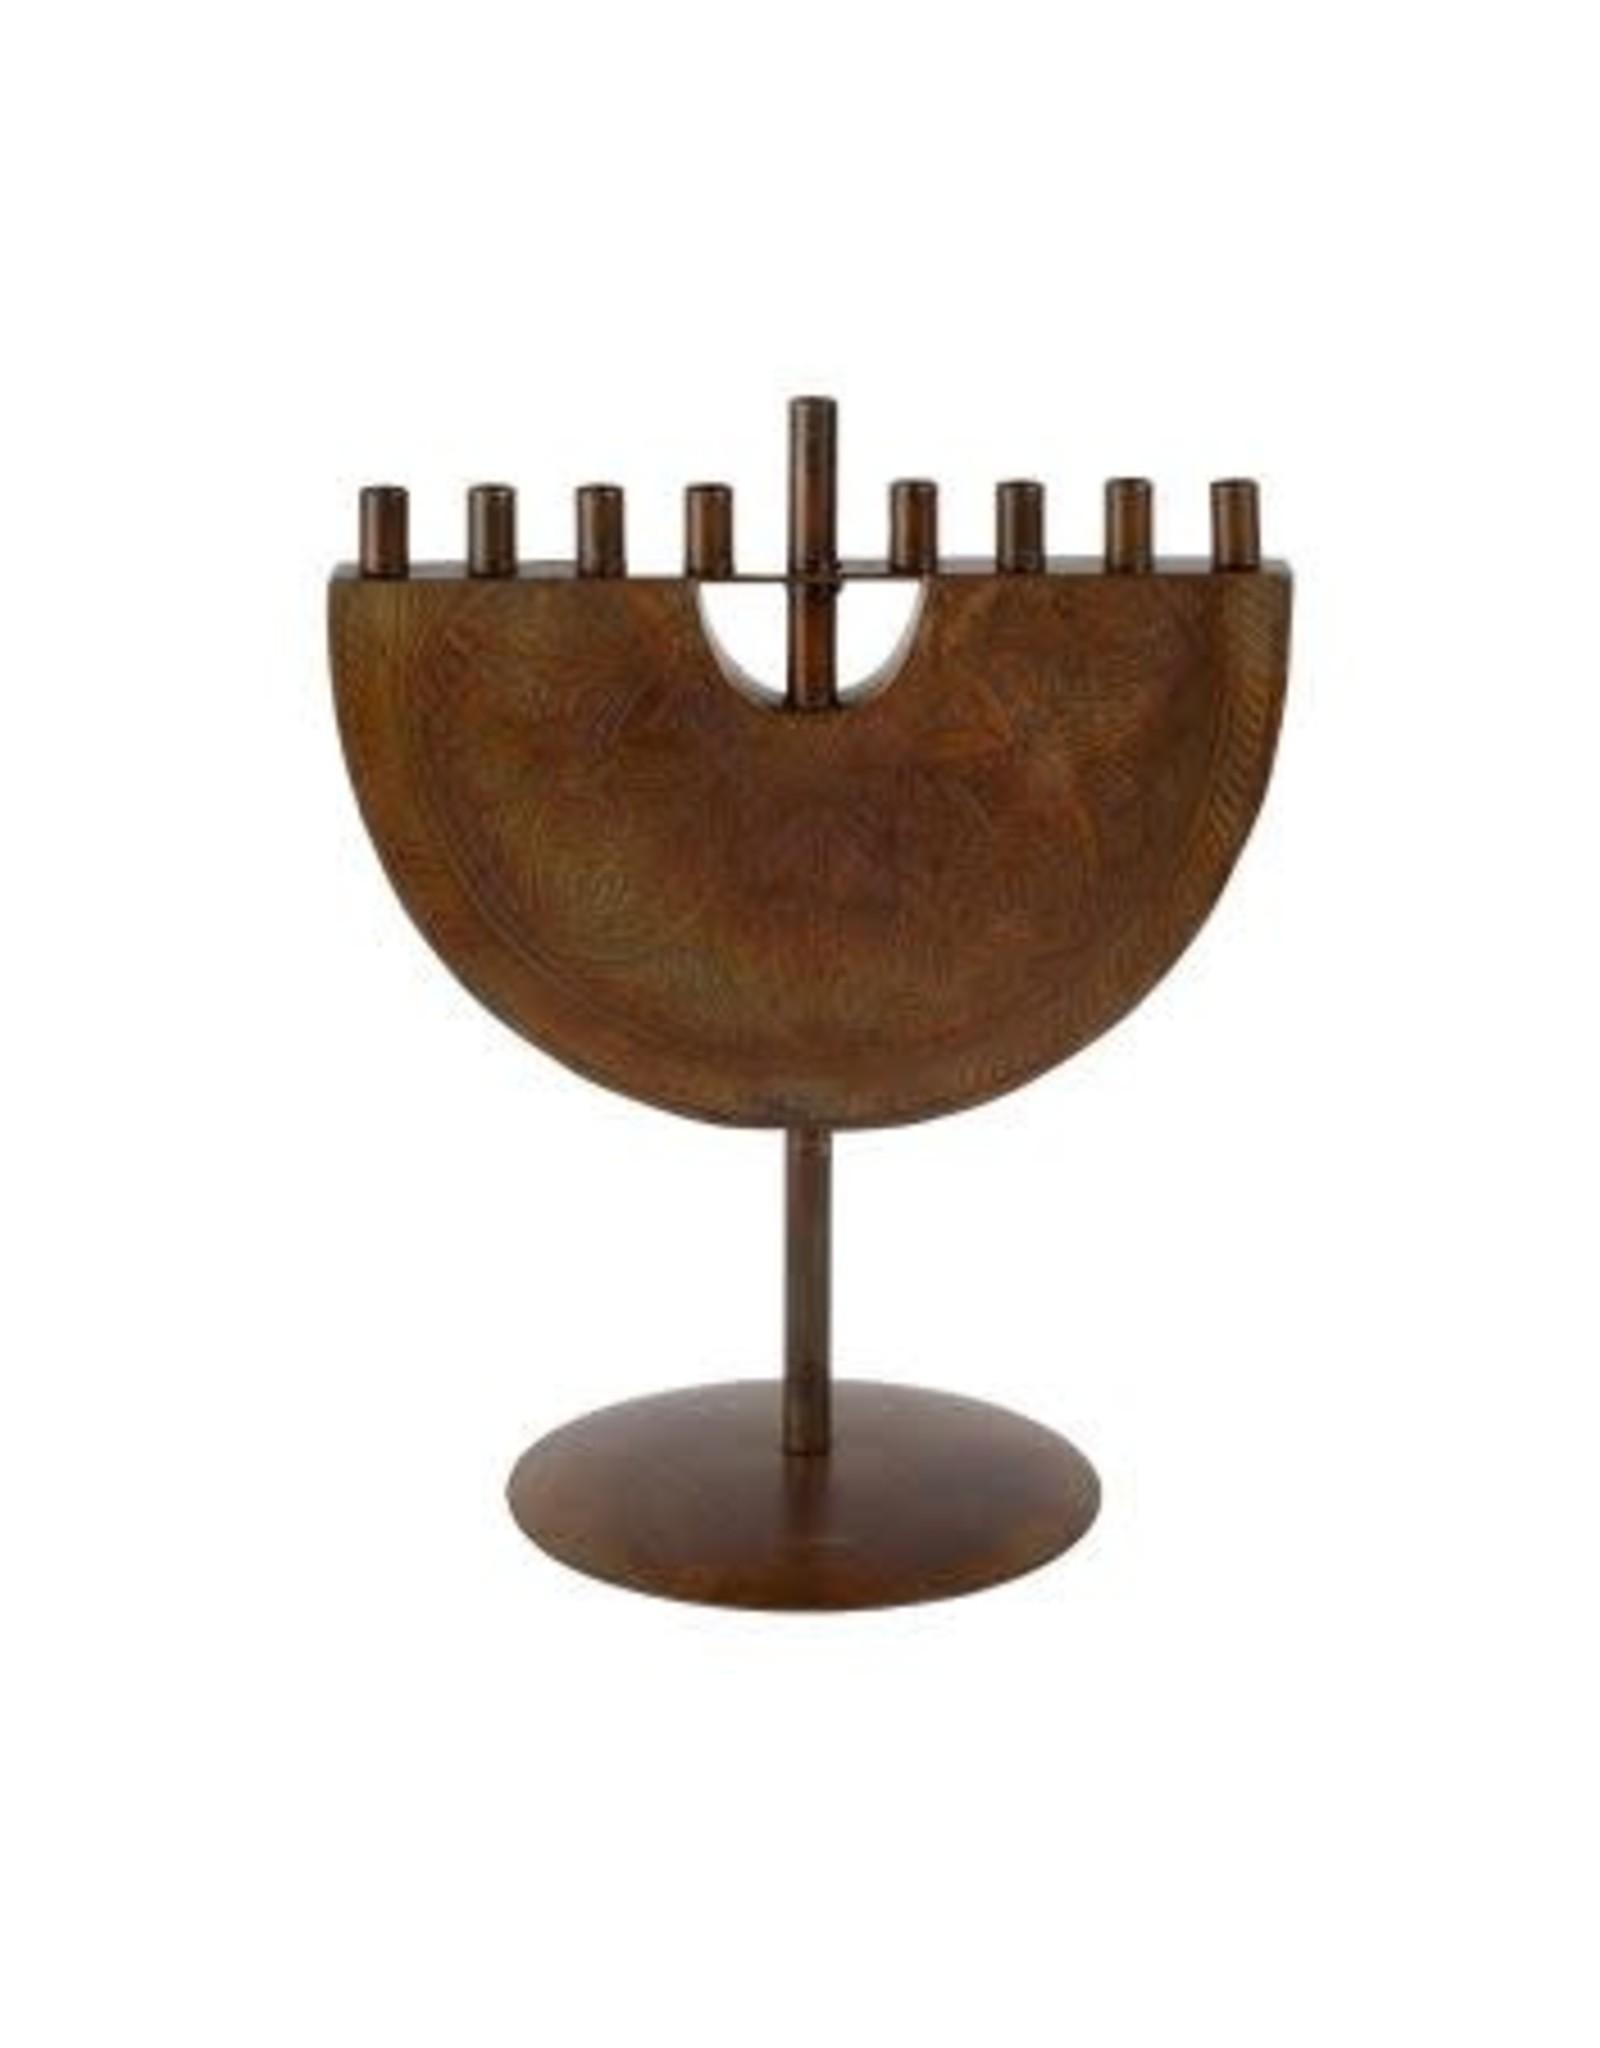 Engraved Iron Menorah, India